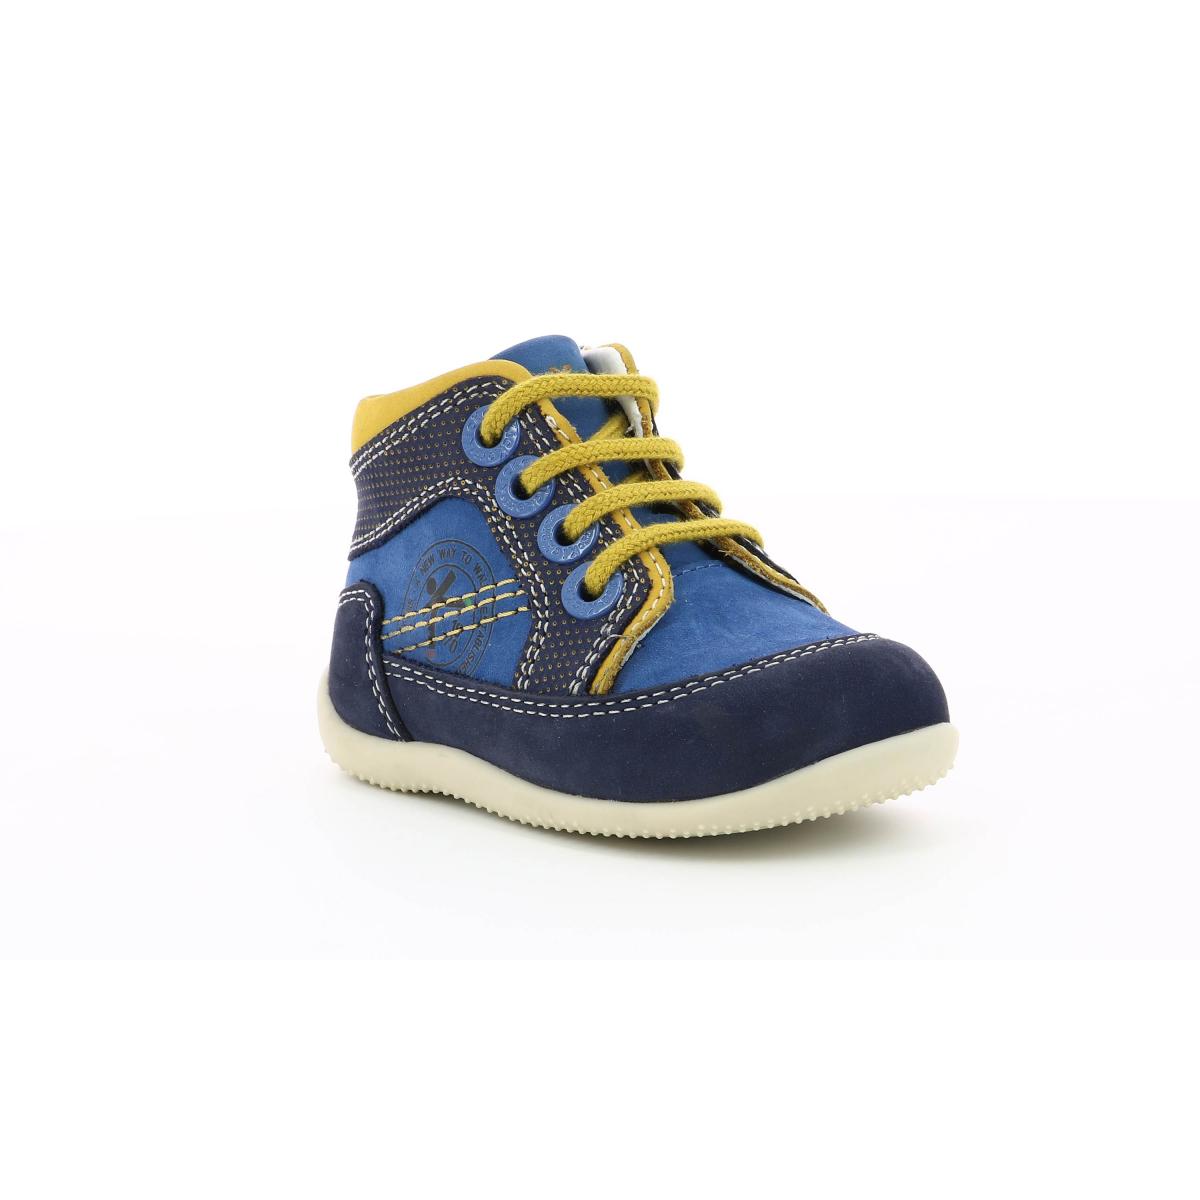 Enfant Biboy Chaussures Bleu Jaune Kickers 4R35AjLq